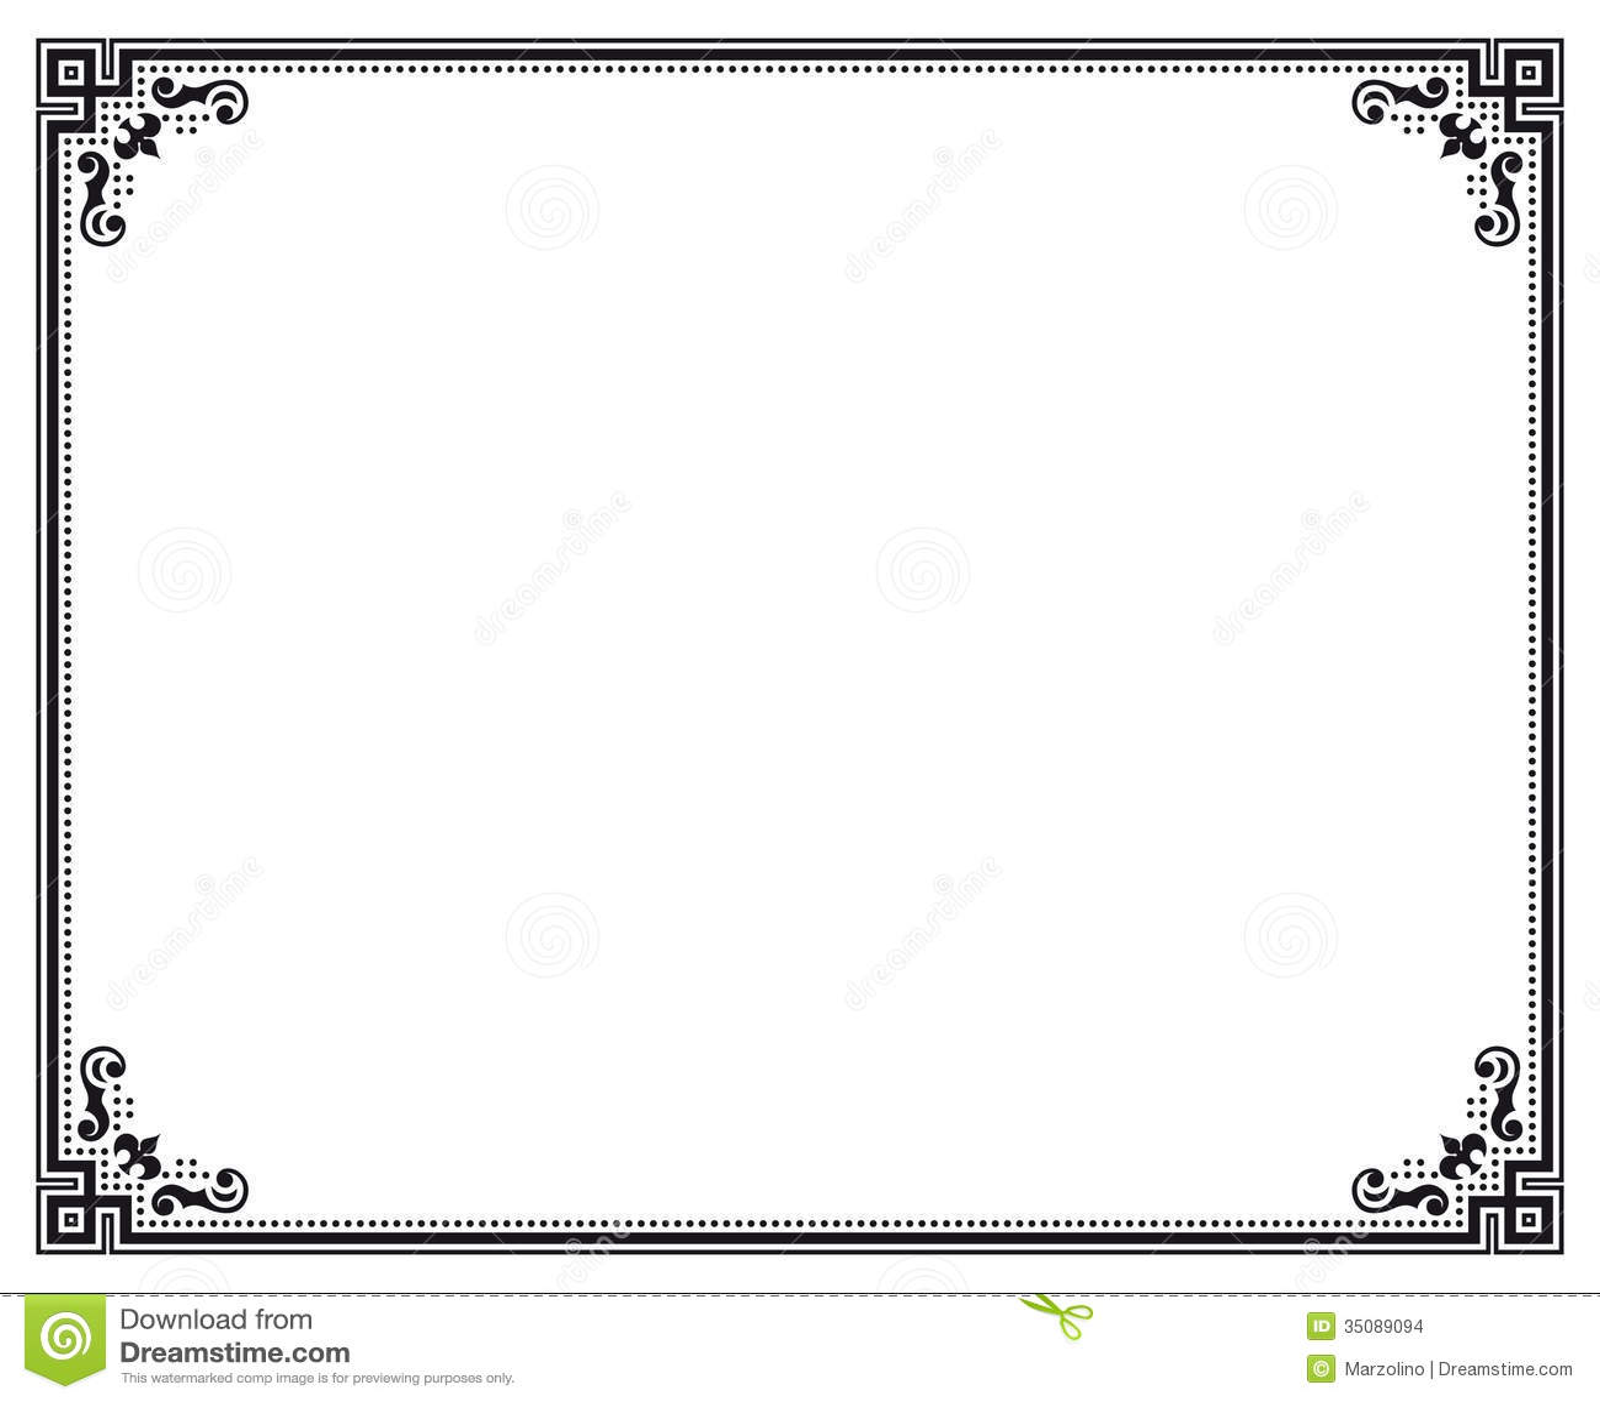 black certificate border templates